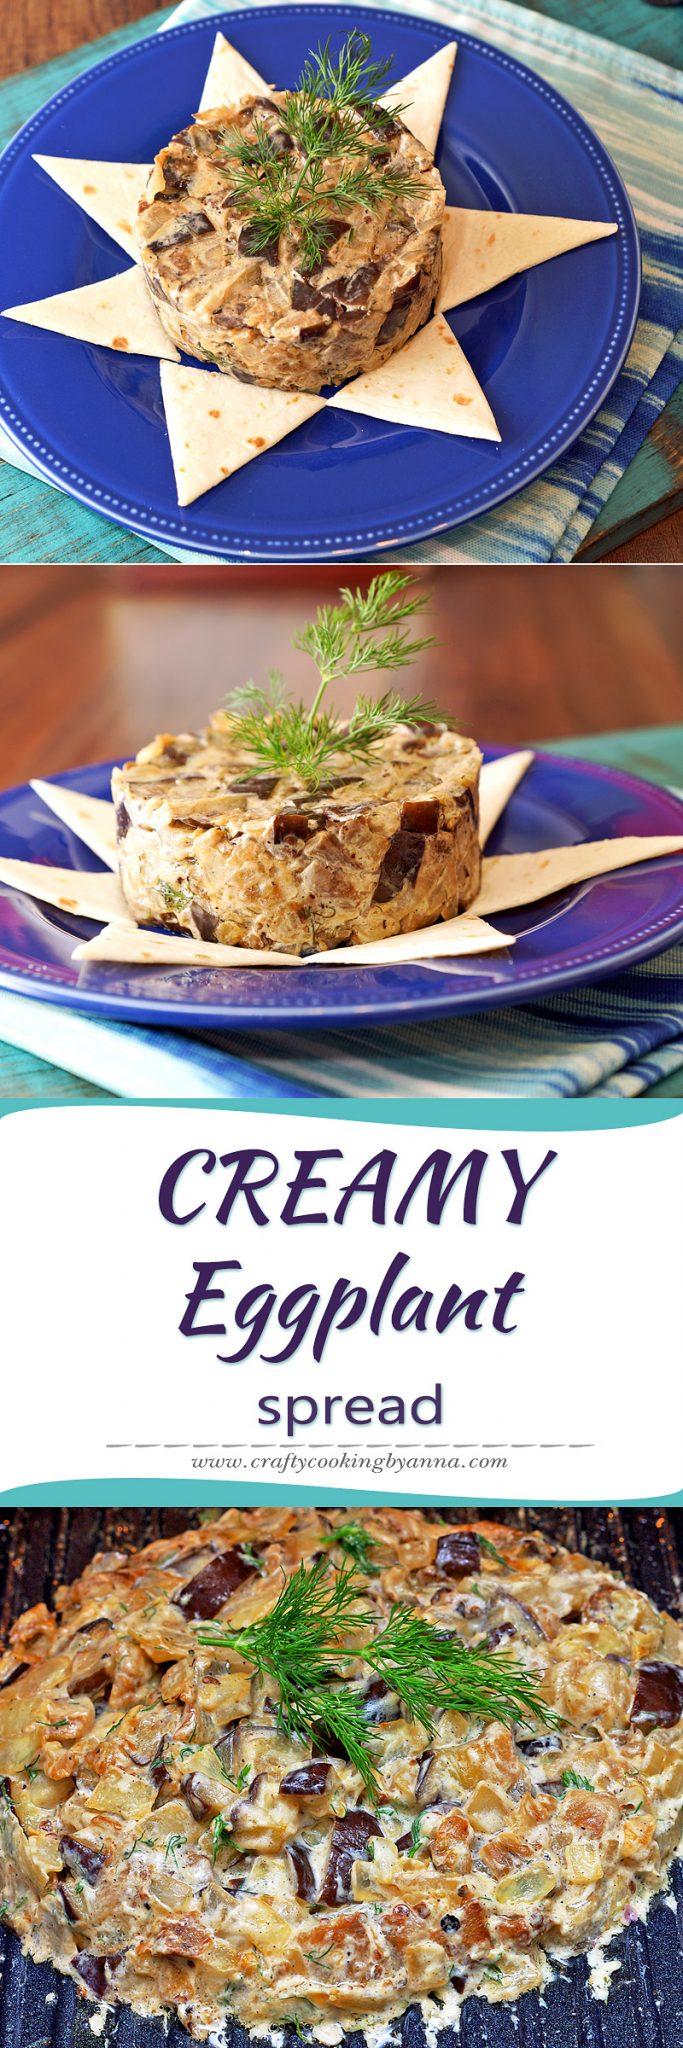 Creamy eggplant spread